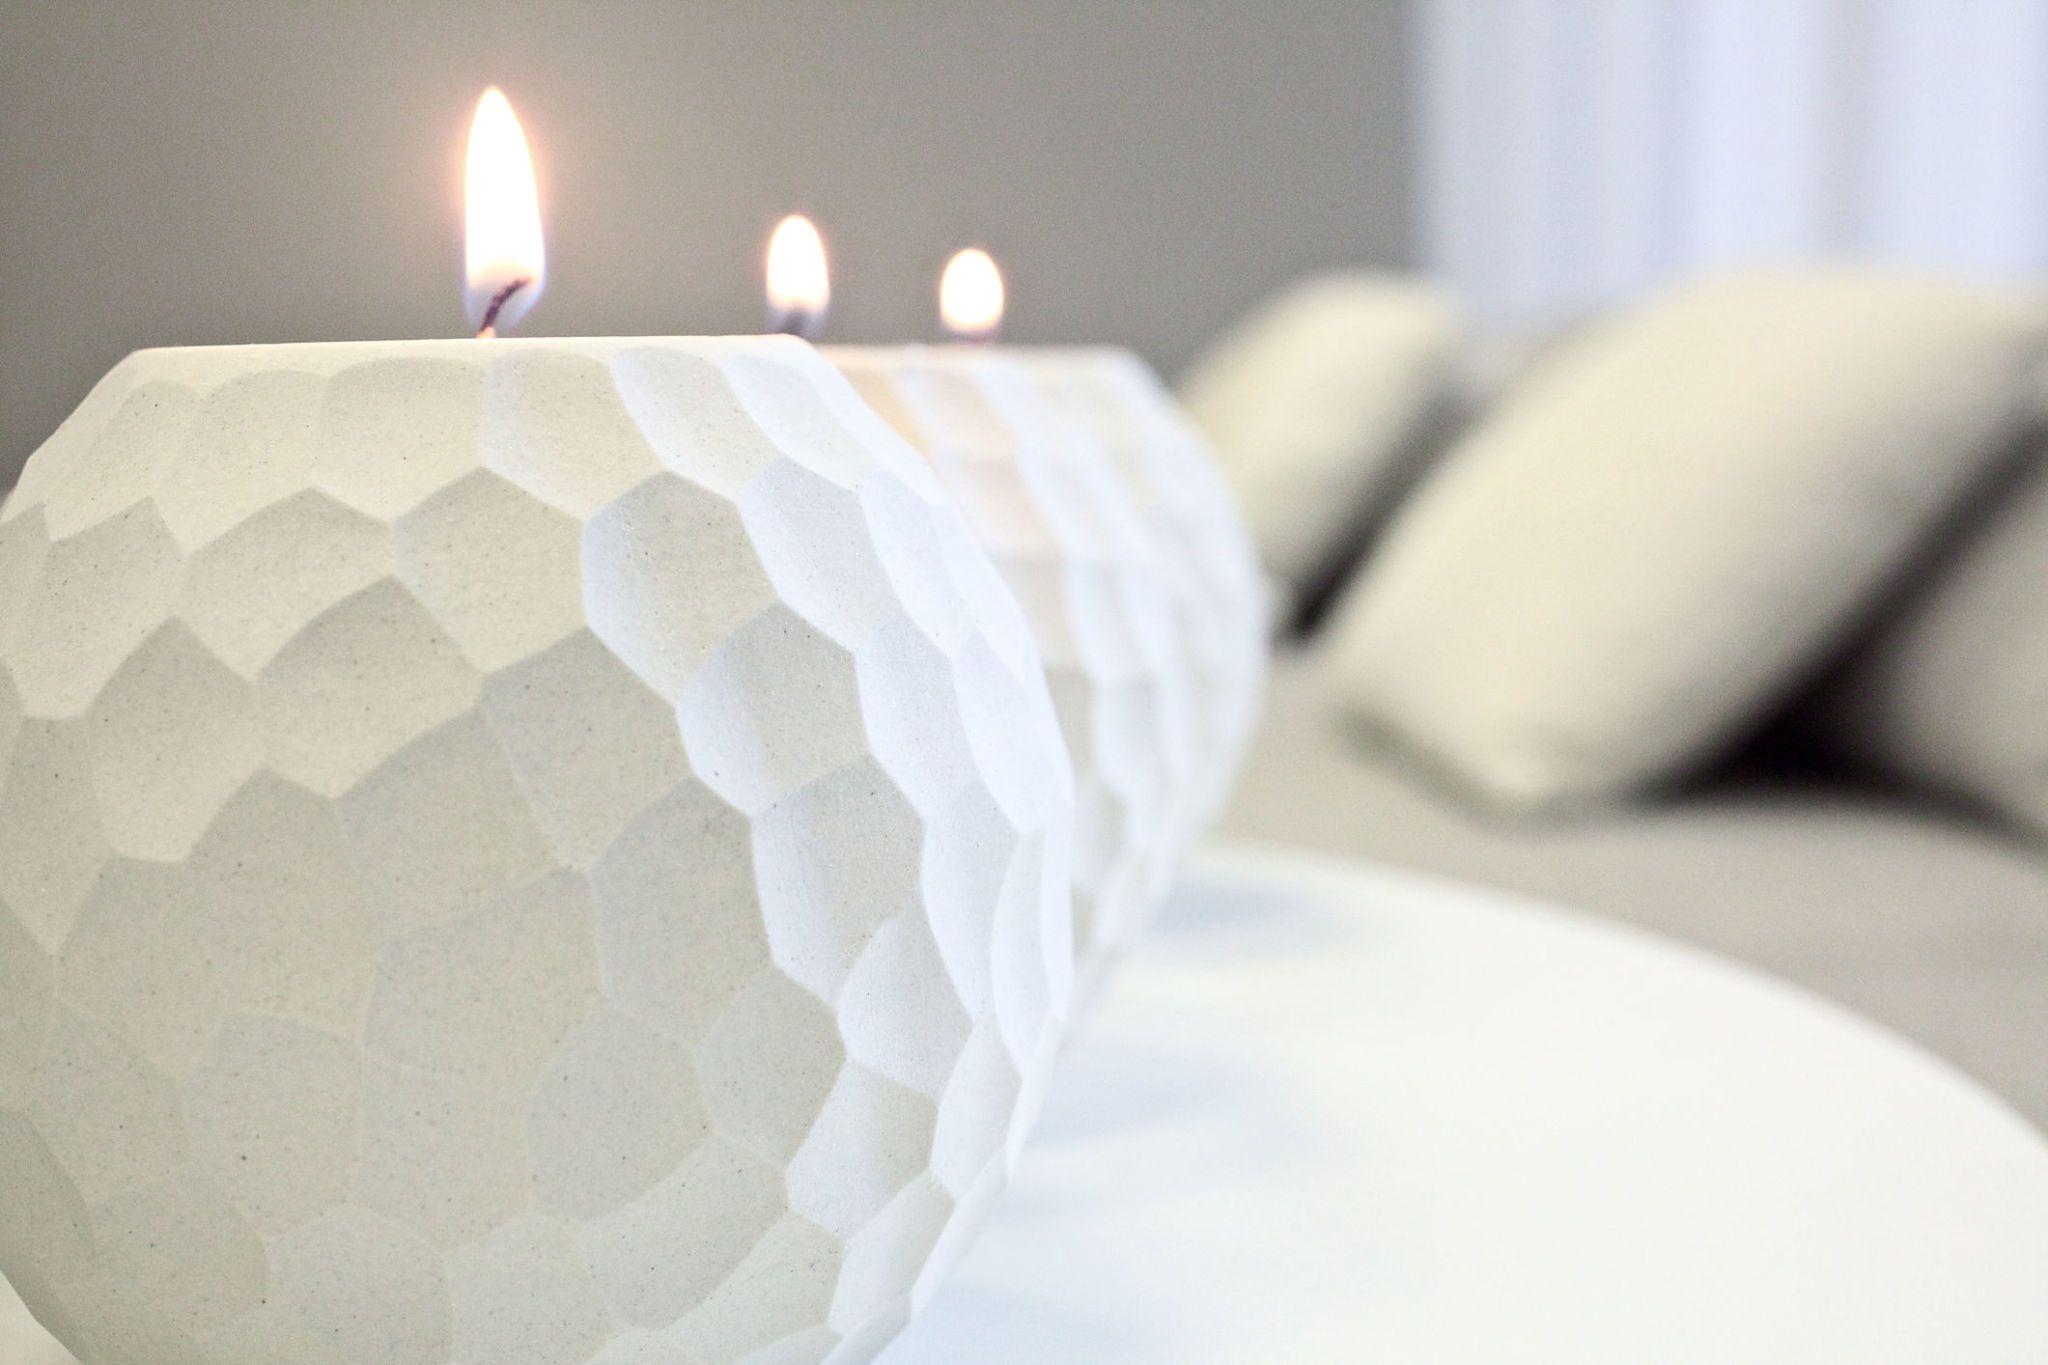 How long do ikea tea light candles burn